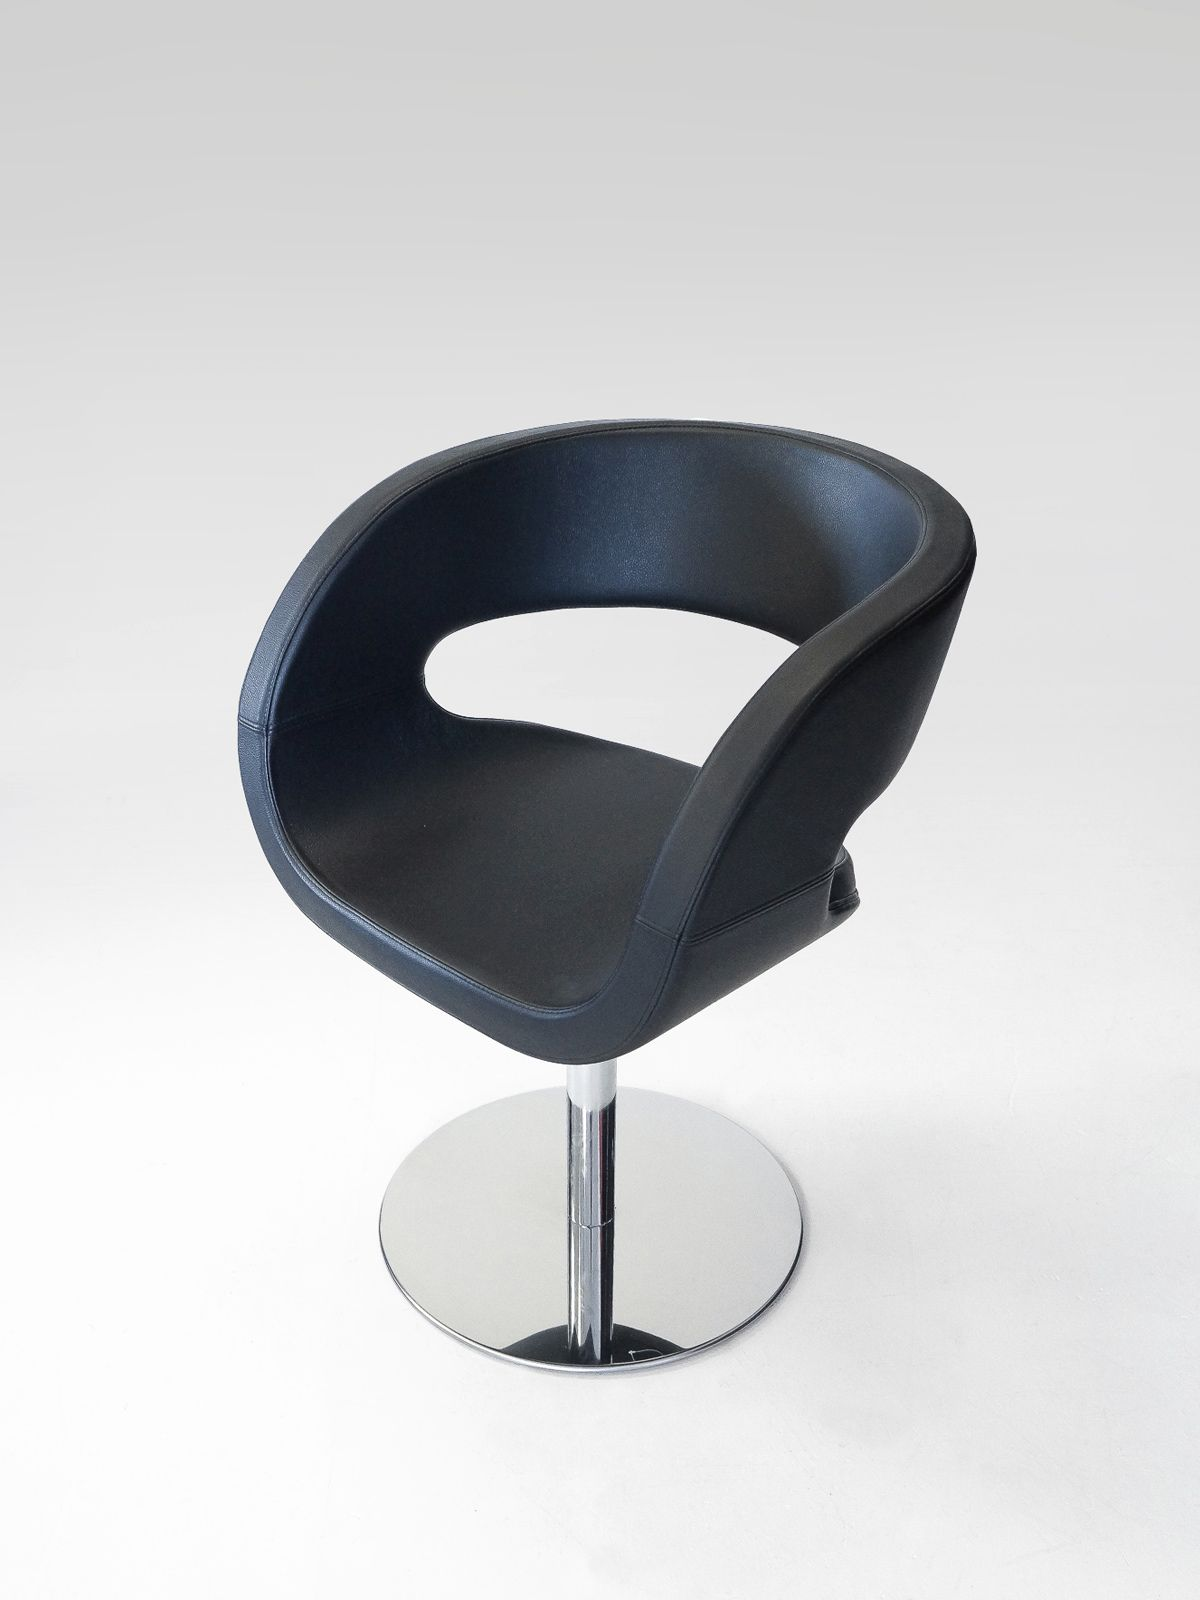 Moderne Küche Stuhl | Stühle | Pinterest